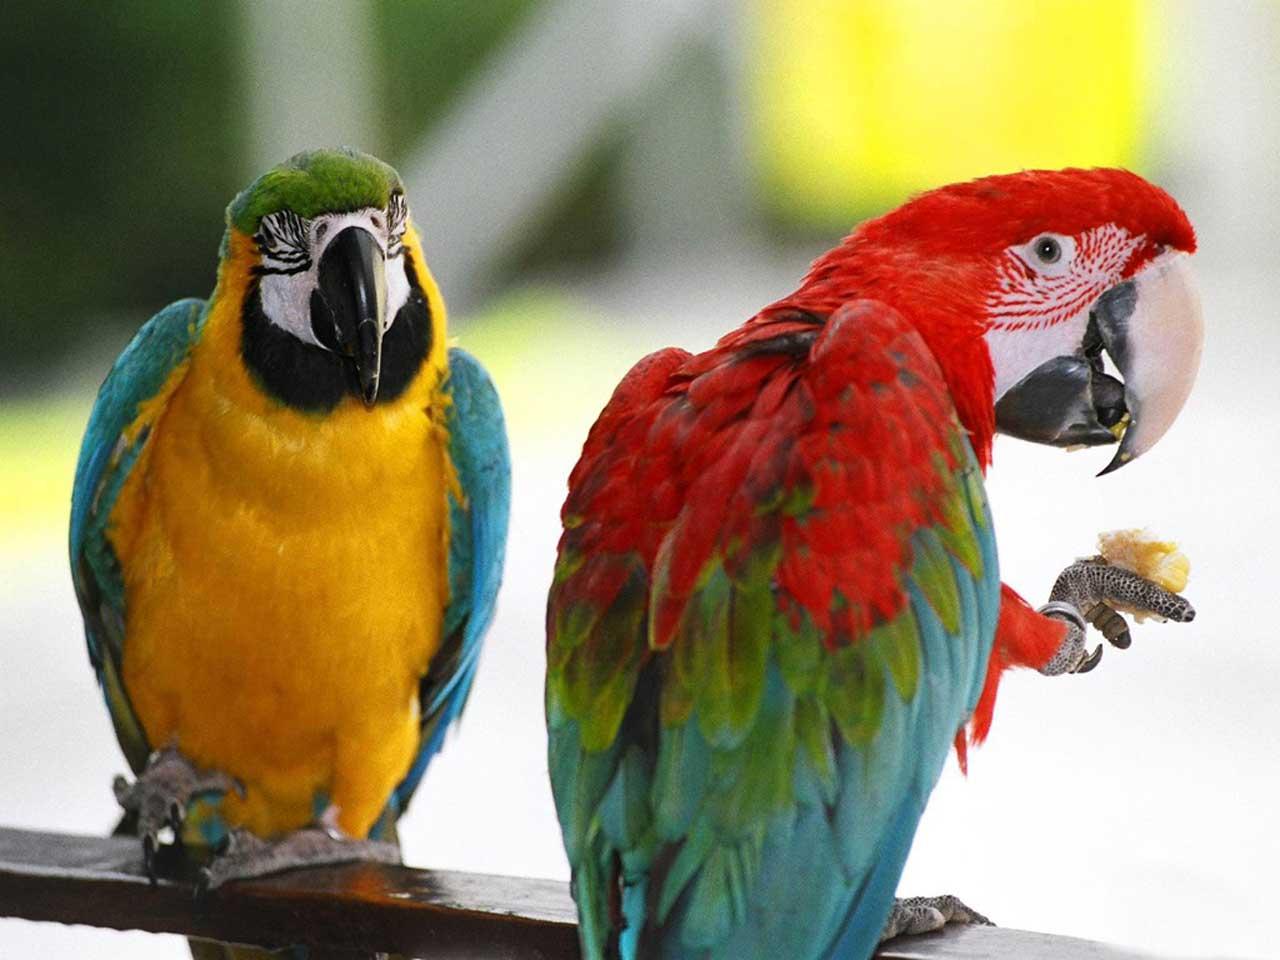 http://1.bp.blogspot.com/-zlHXV5m2f4Y/TZgJmgpD5lI/AAAAAAAAICo/OzX30W9SWQc/s1600/amazing_wild_life_photography_birds_desktop_wallpapers_11.jpg